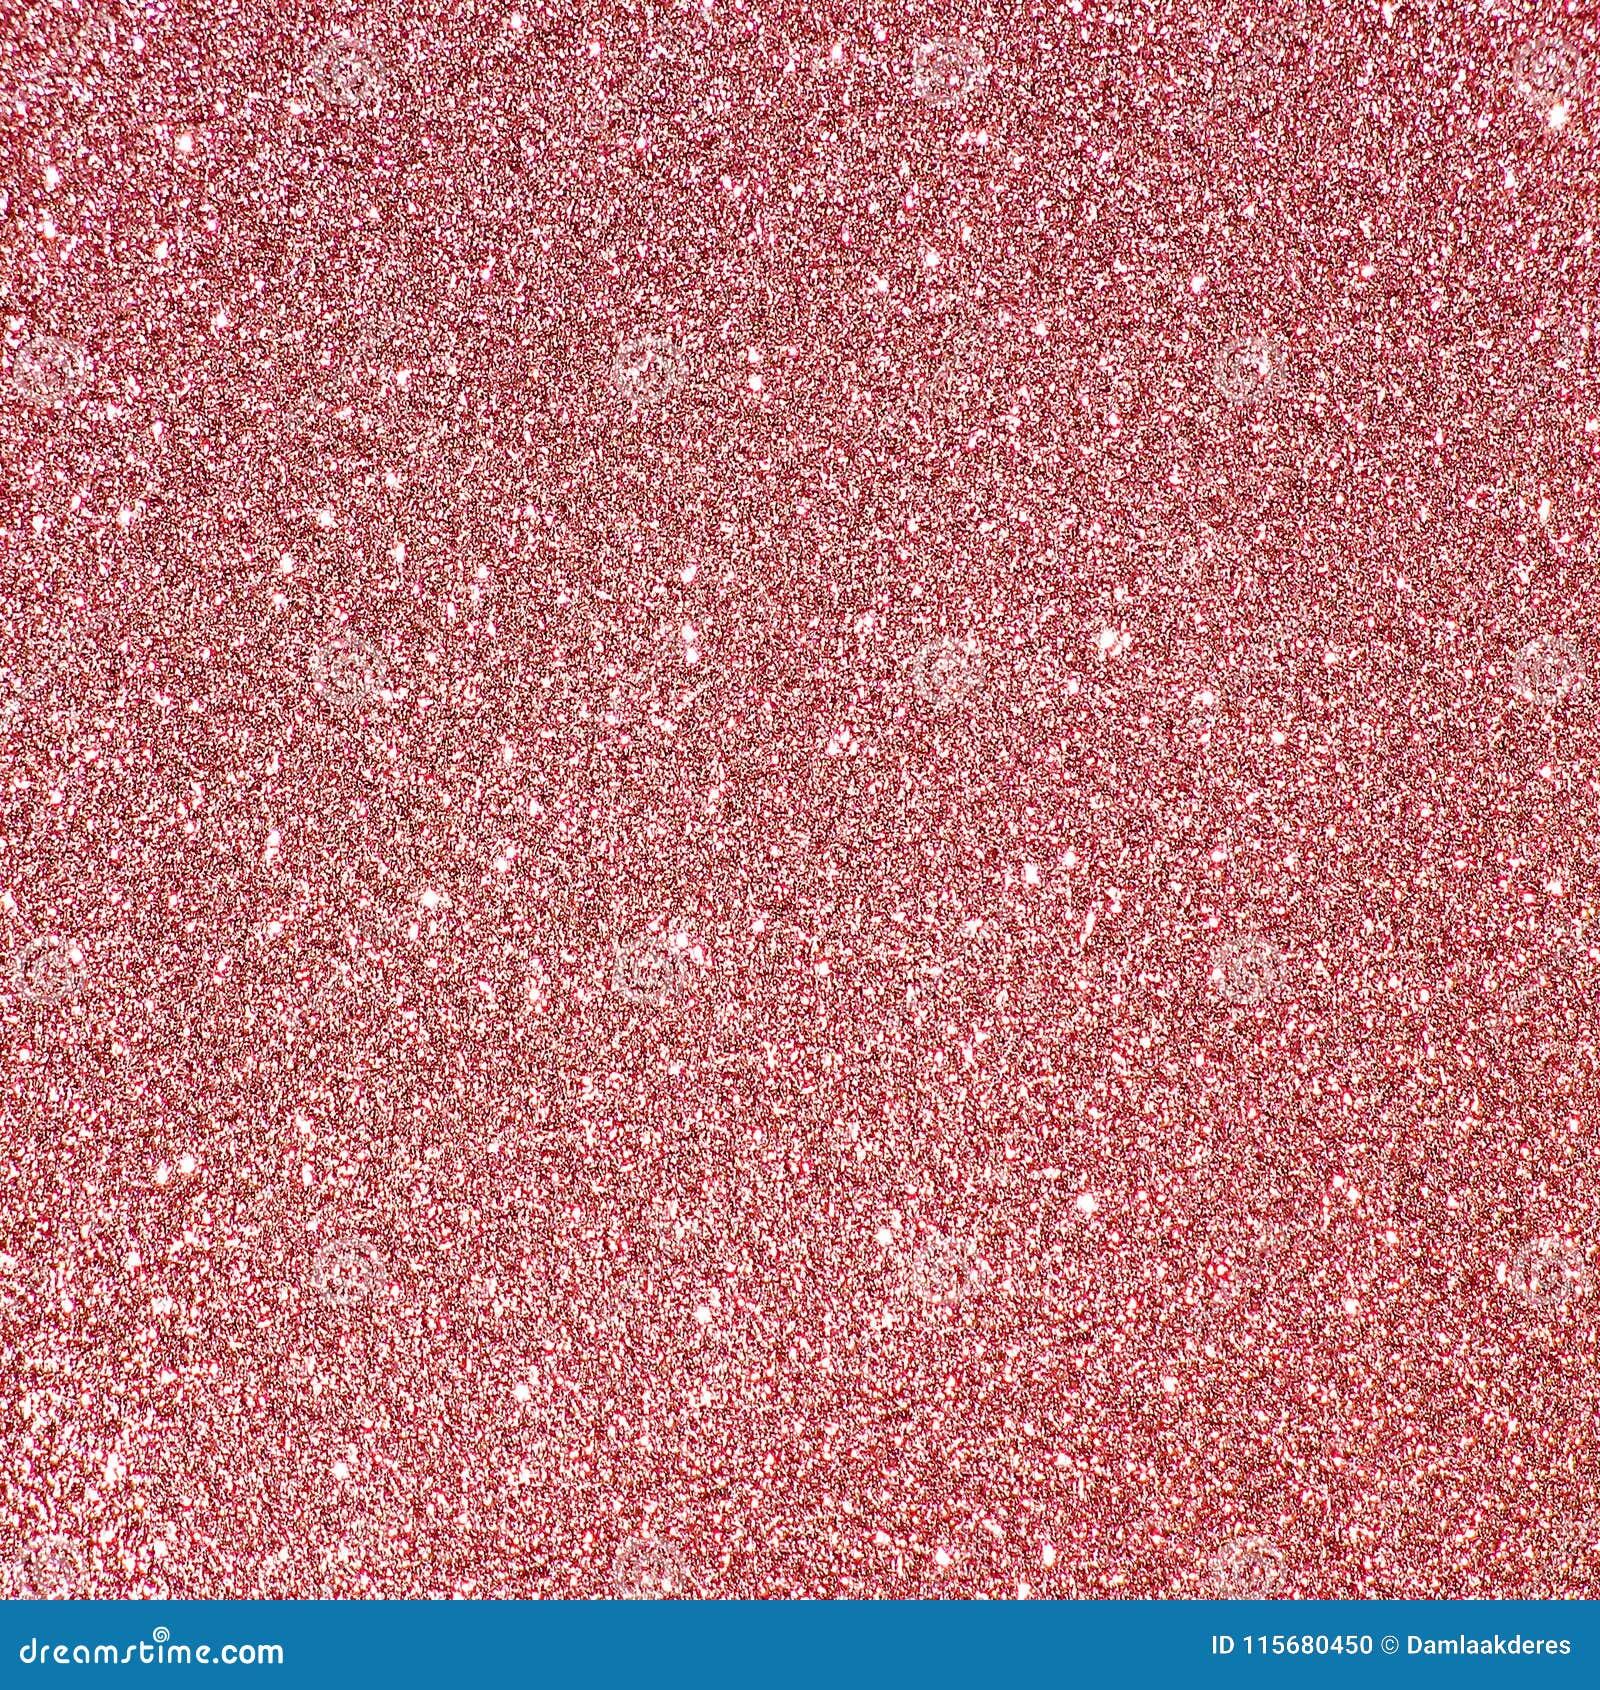 Glitter background. Glitter texture. Pink glitter pattern. Glitter Wallpaper. Shine Background.